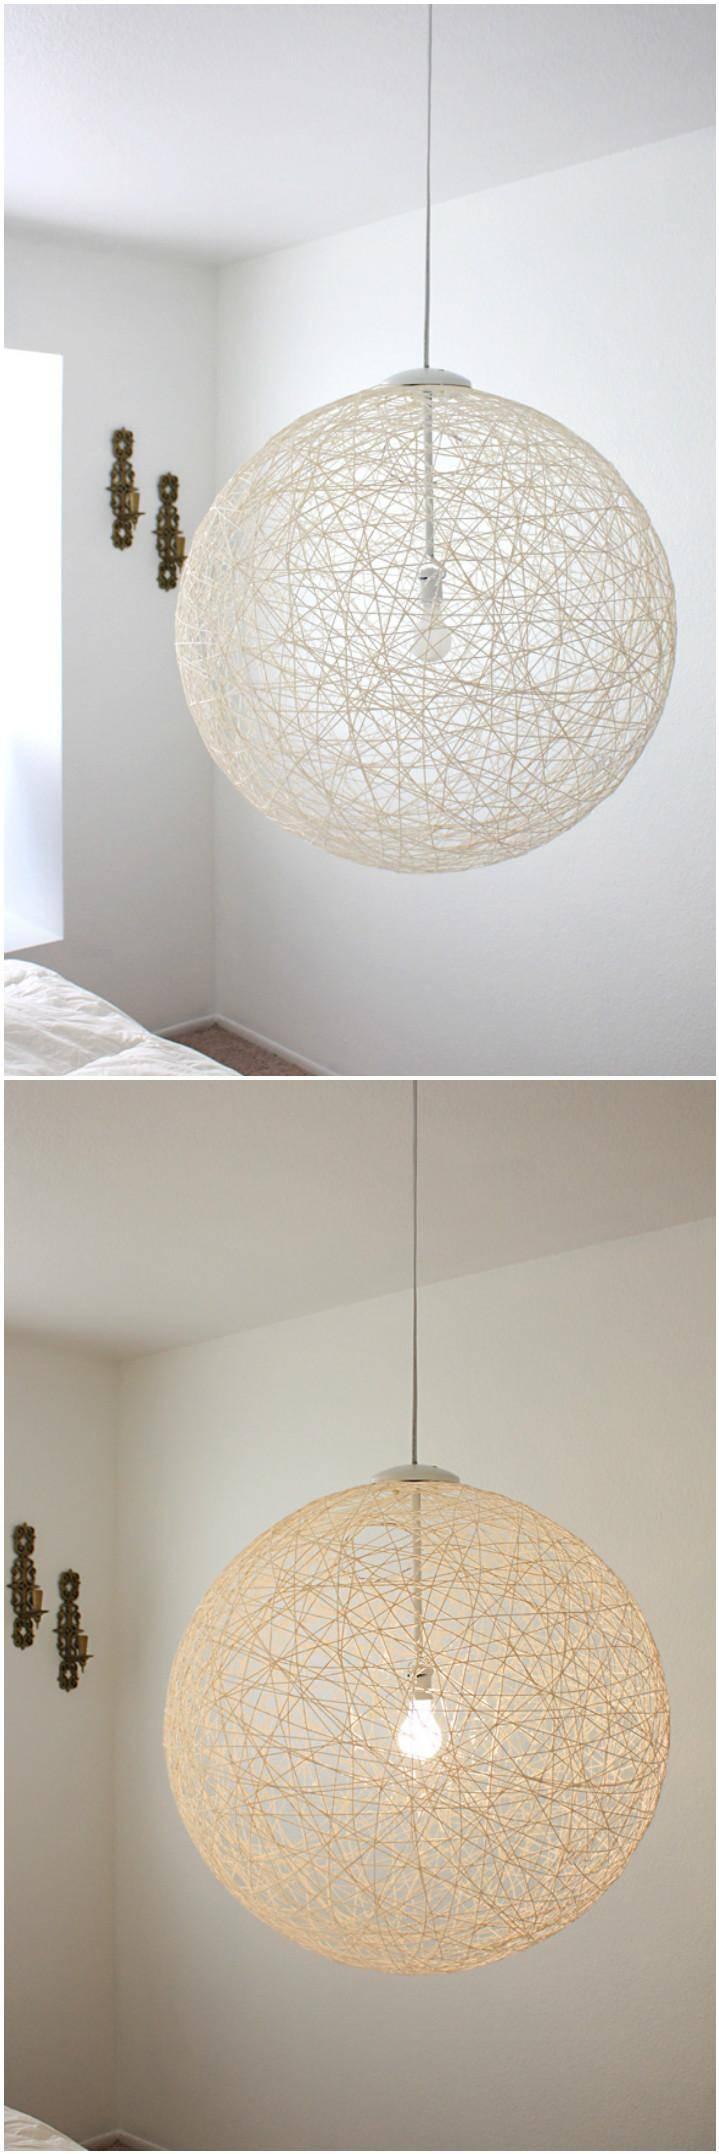 self-made string pendant light